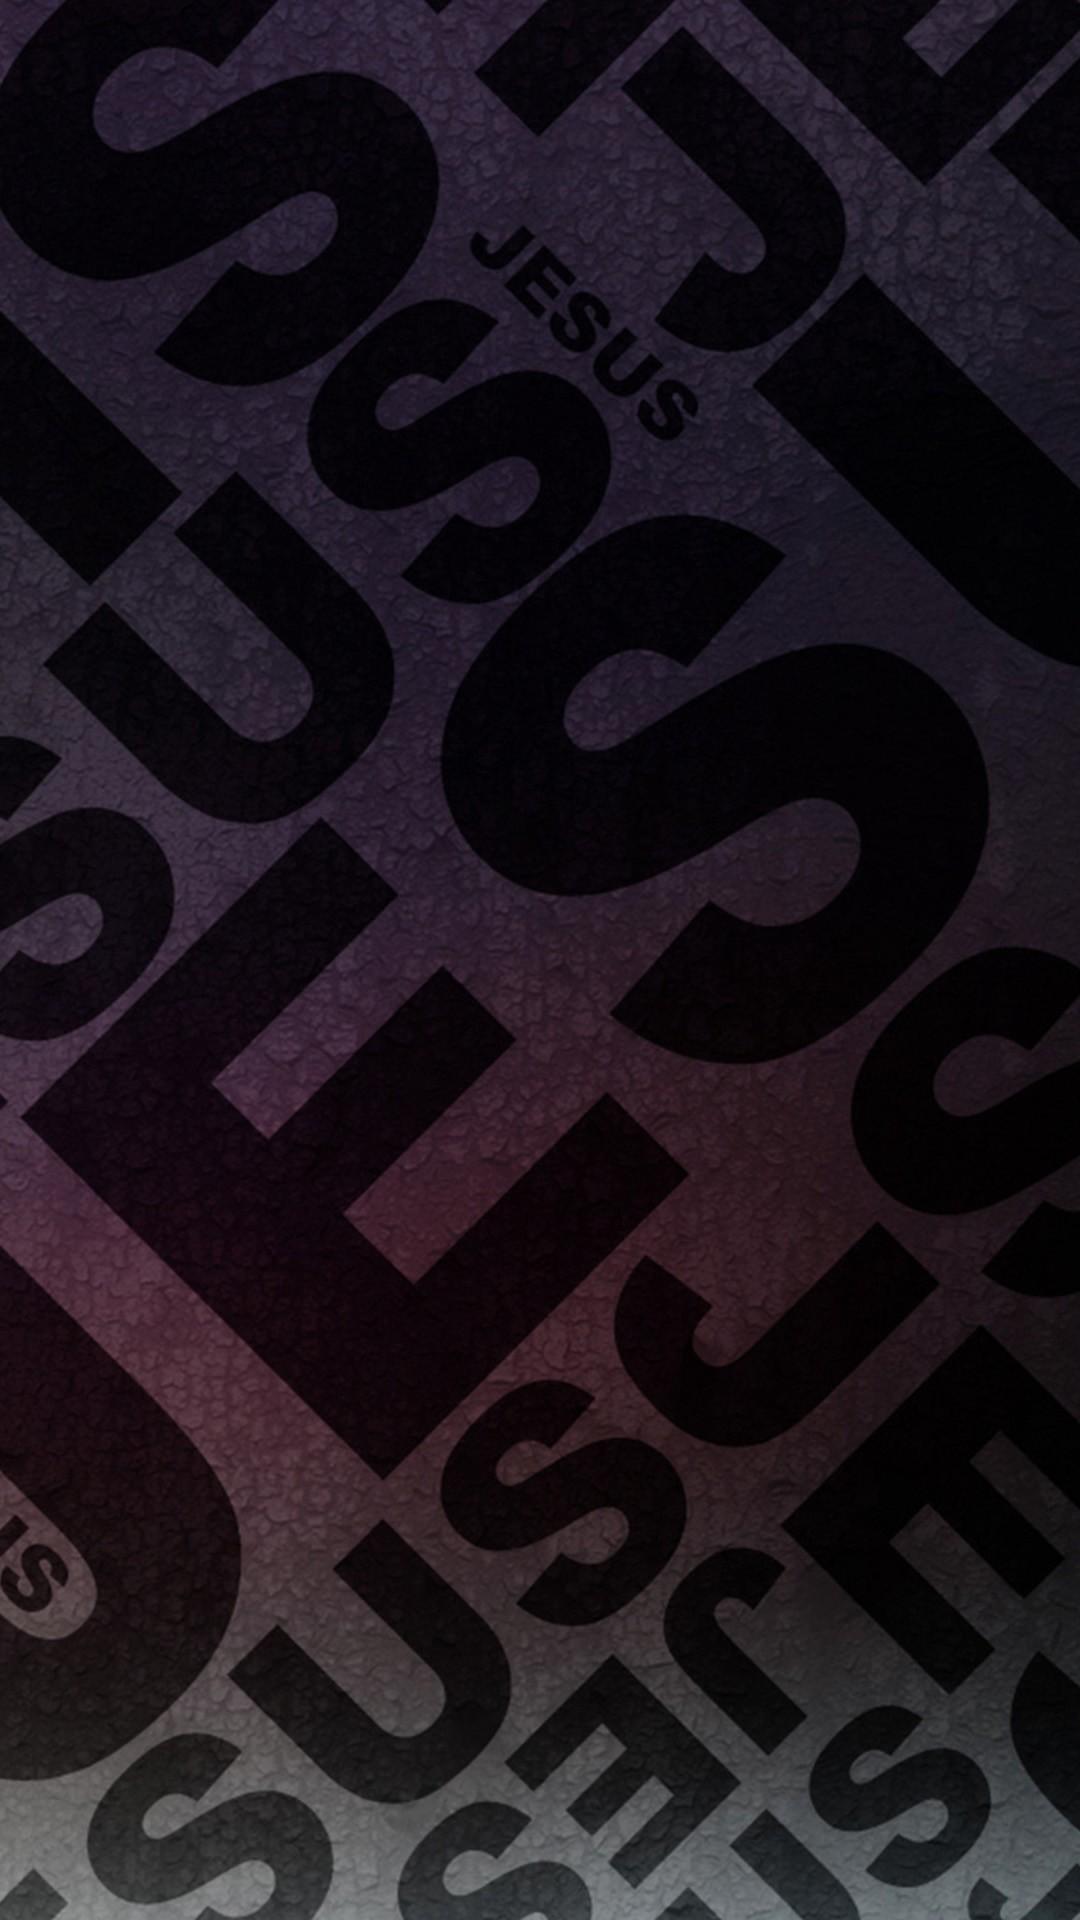 Jesus Sony Phone Lockscreen Wallpaper - Фон Для Телефона Андроид - HD Wallpaper